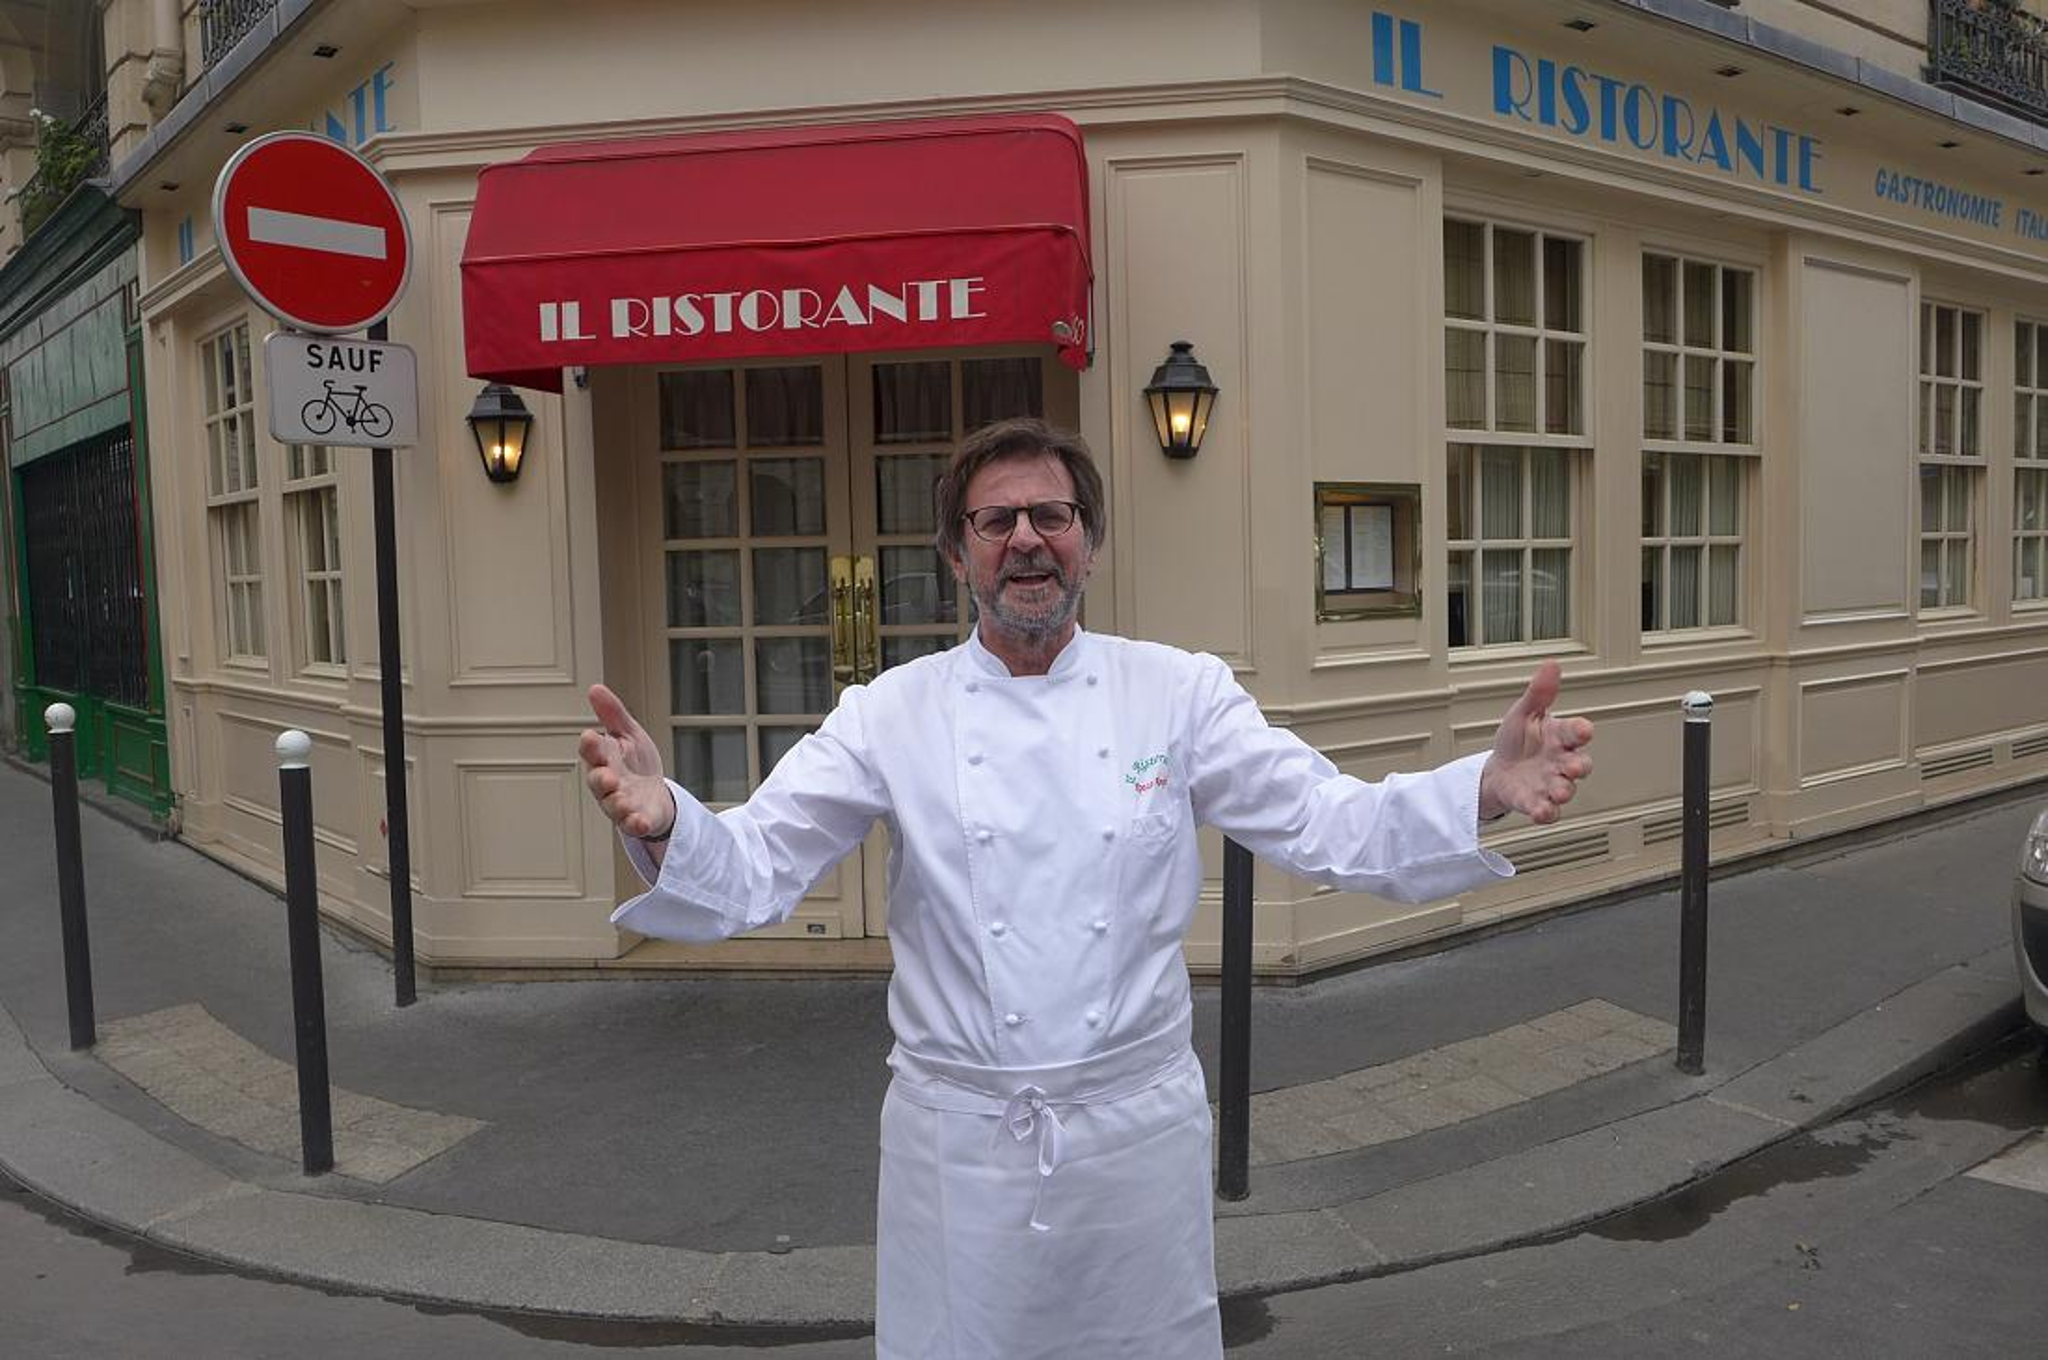 Il ristorante restaurant italien paris 17e les folies - Restaurant italien porte maillot paris 17 ...